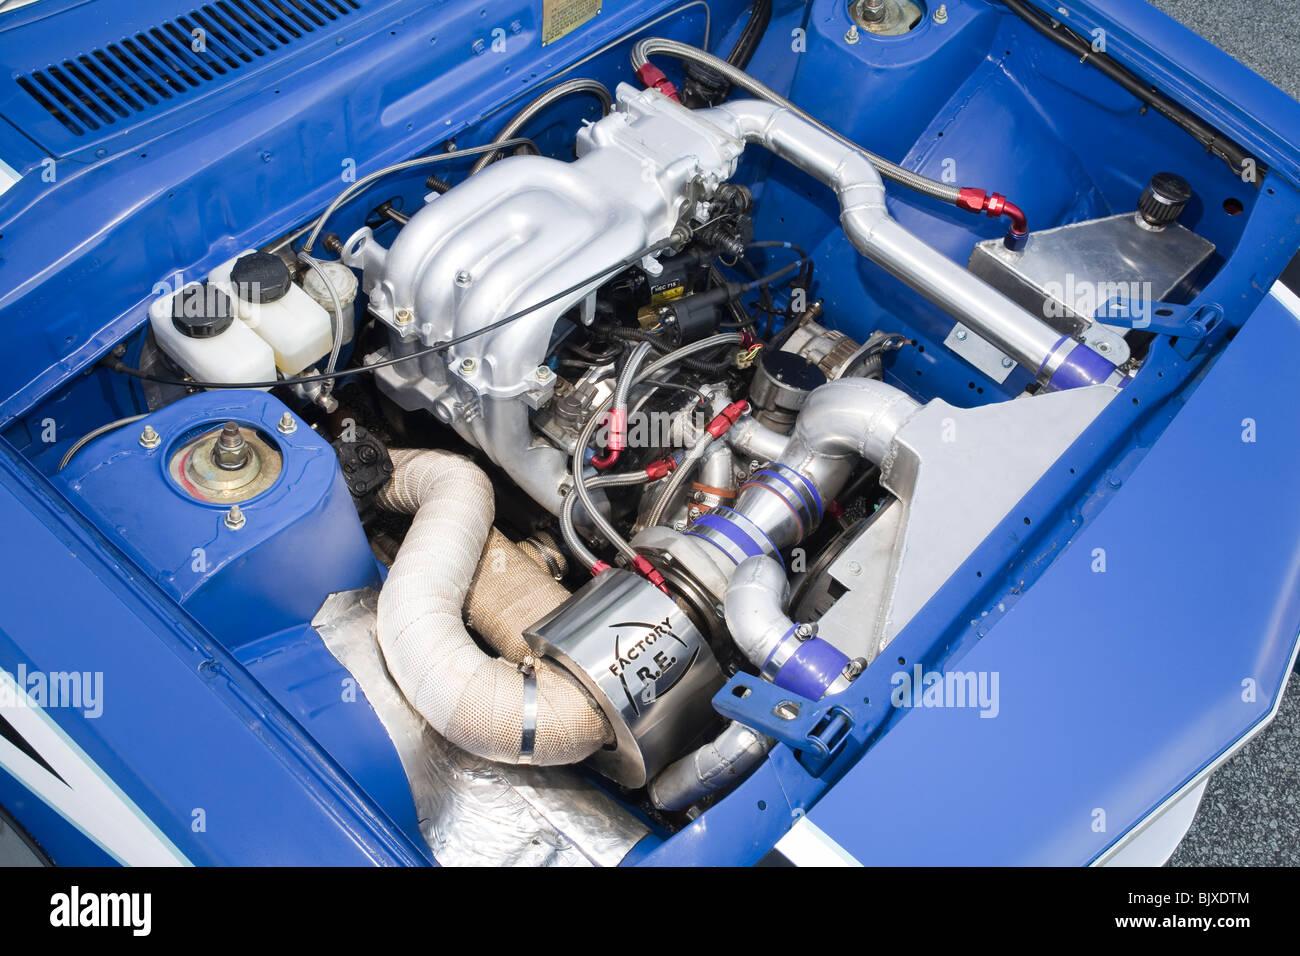 heavily modified rotary wankel engine mazda rx7 sports car built